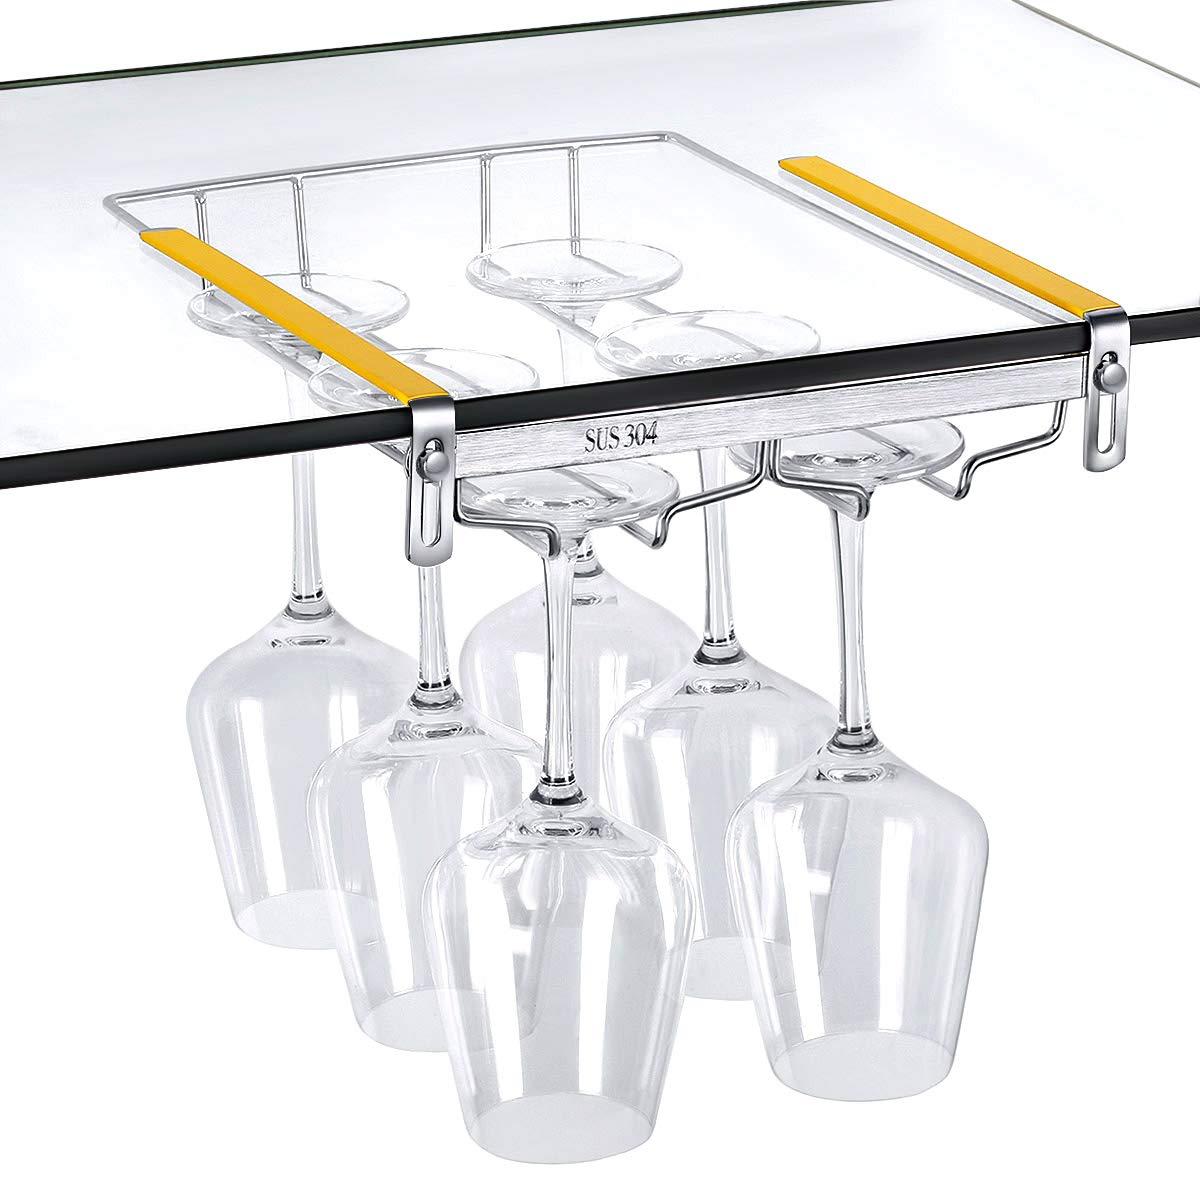 VOBAGA Wine Glass Holder, Stemware Rack Under Cabinet Storage 2 Rows Adjustable Stainless Steel Wine Glass Rack,Hold 6 Glasses